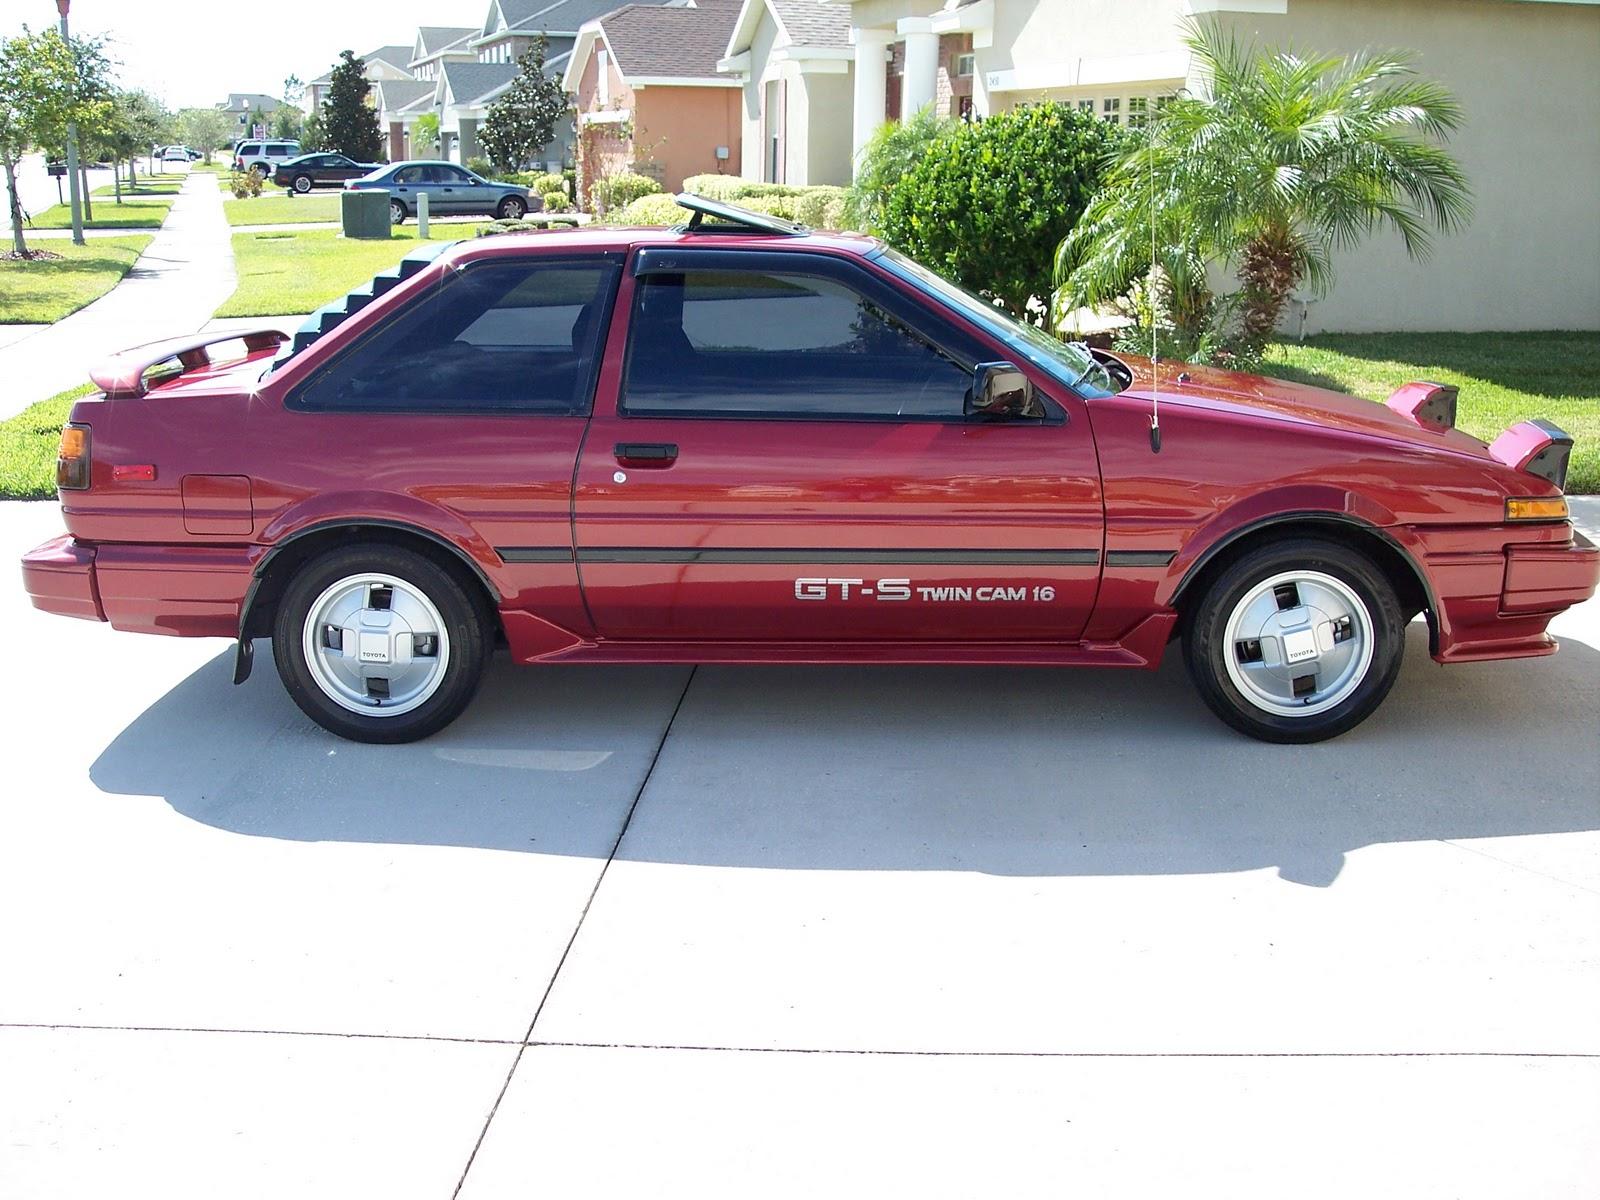 My Own Car Unfortunately 1990 Australian Delivered Toyota Corolla Seca Sx Ae93 Shitty Car Mods